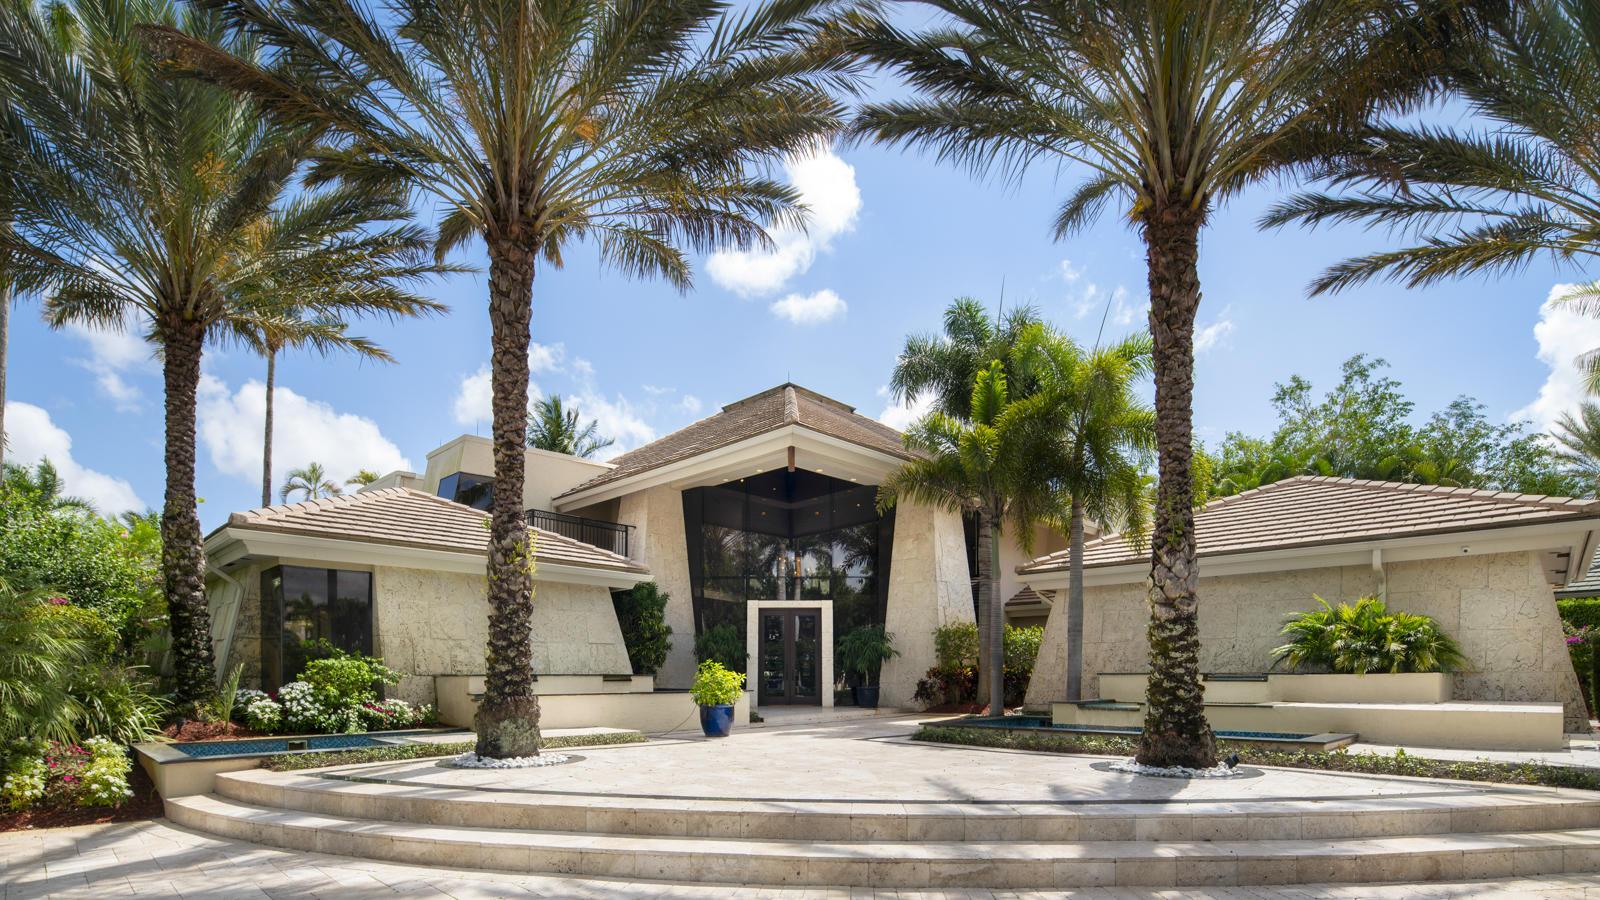 Photo of 5246 Princeton Way, Boca Raton, FL 33496